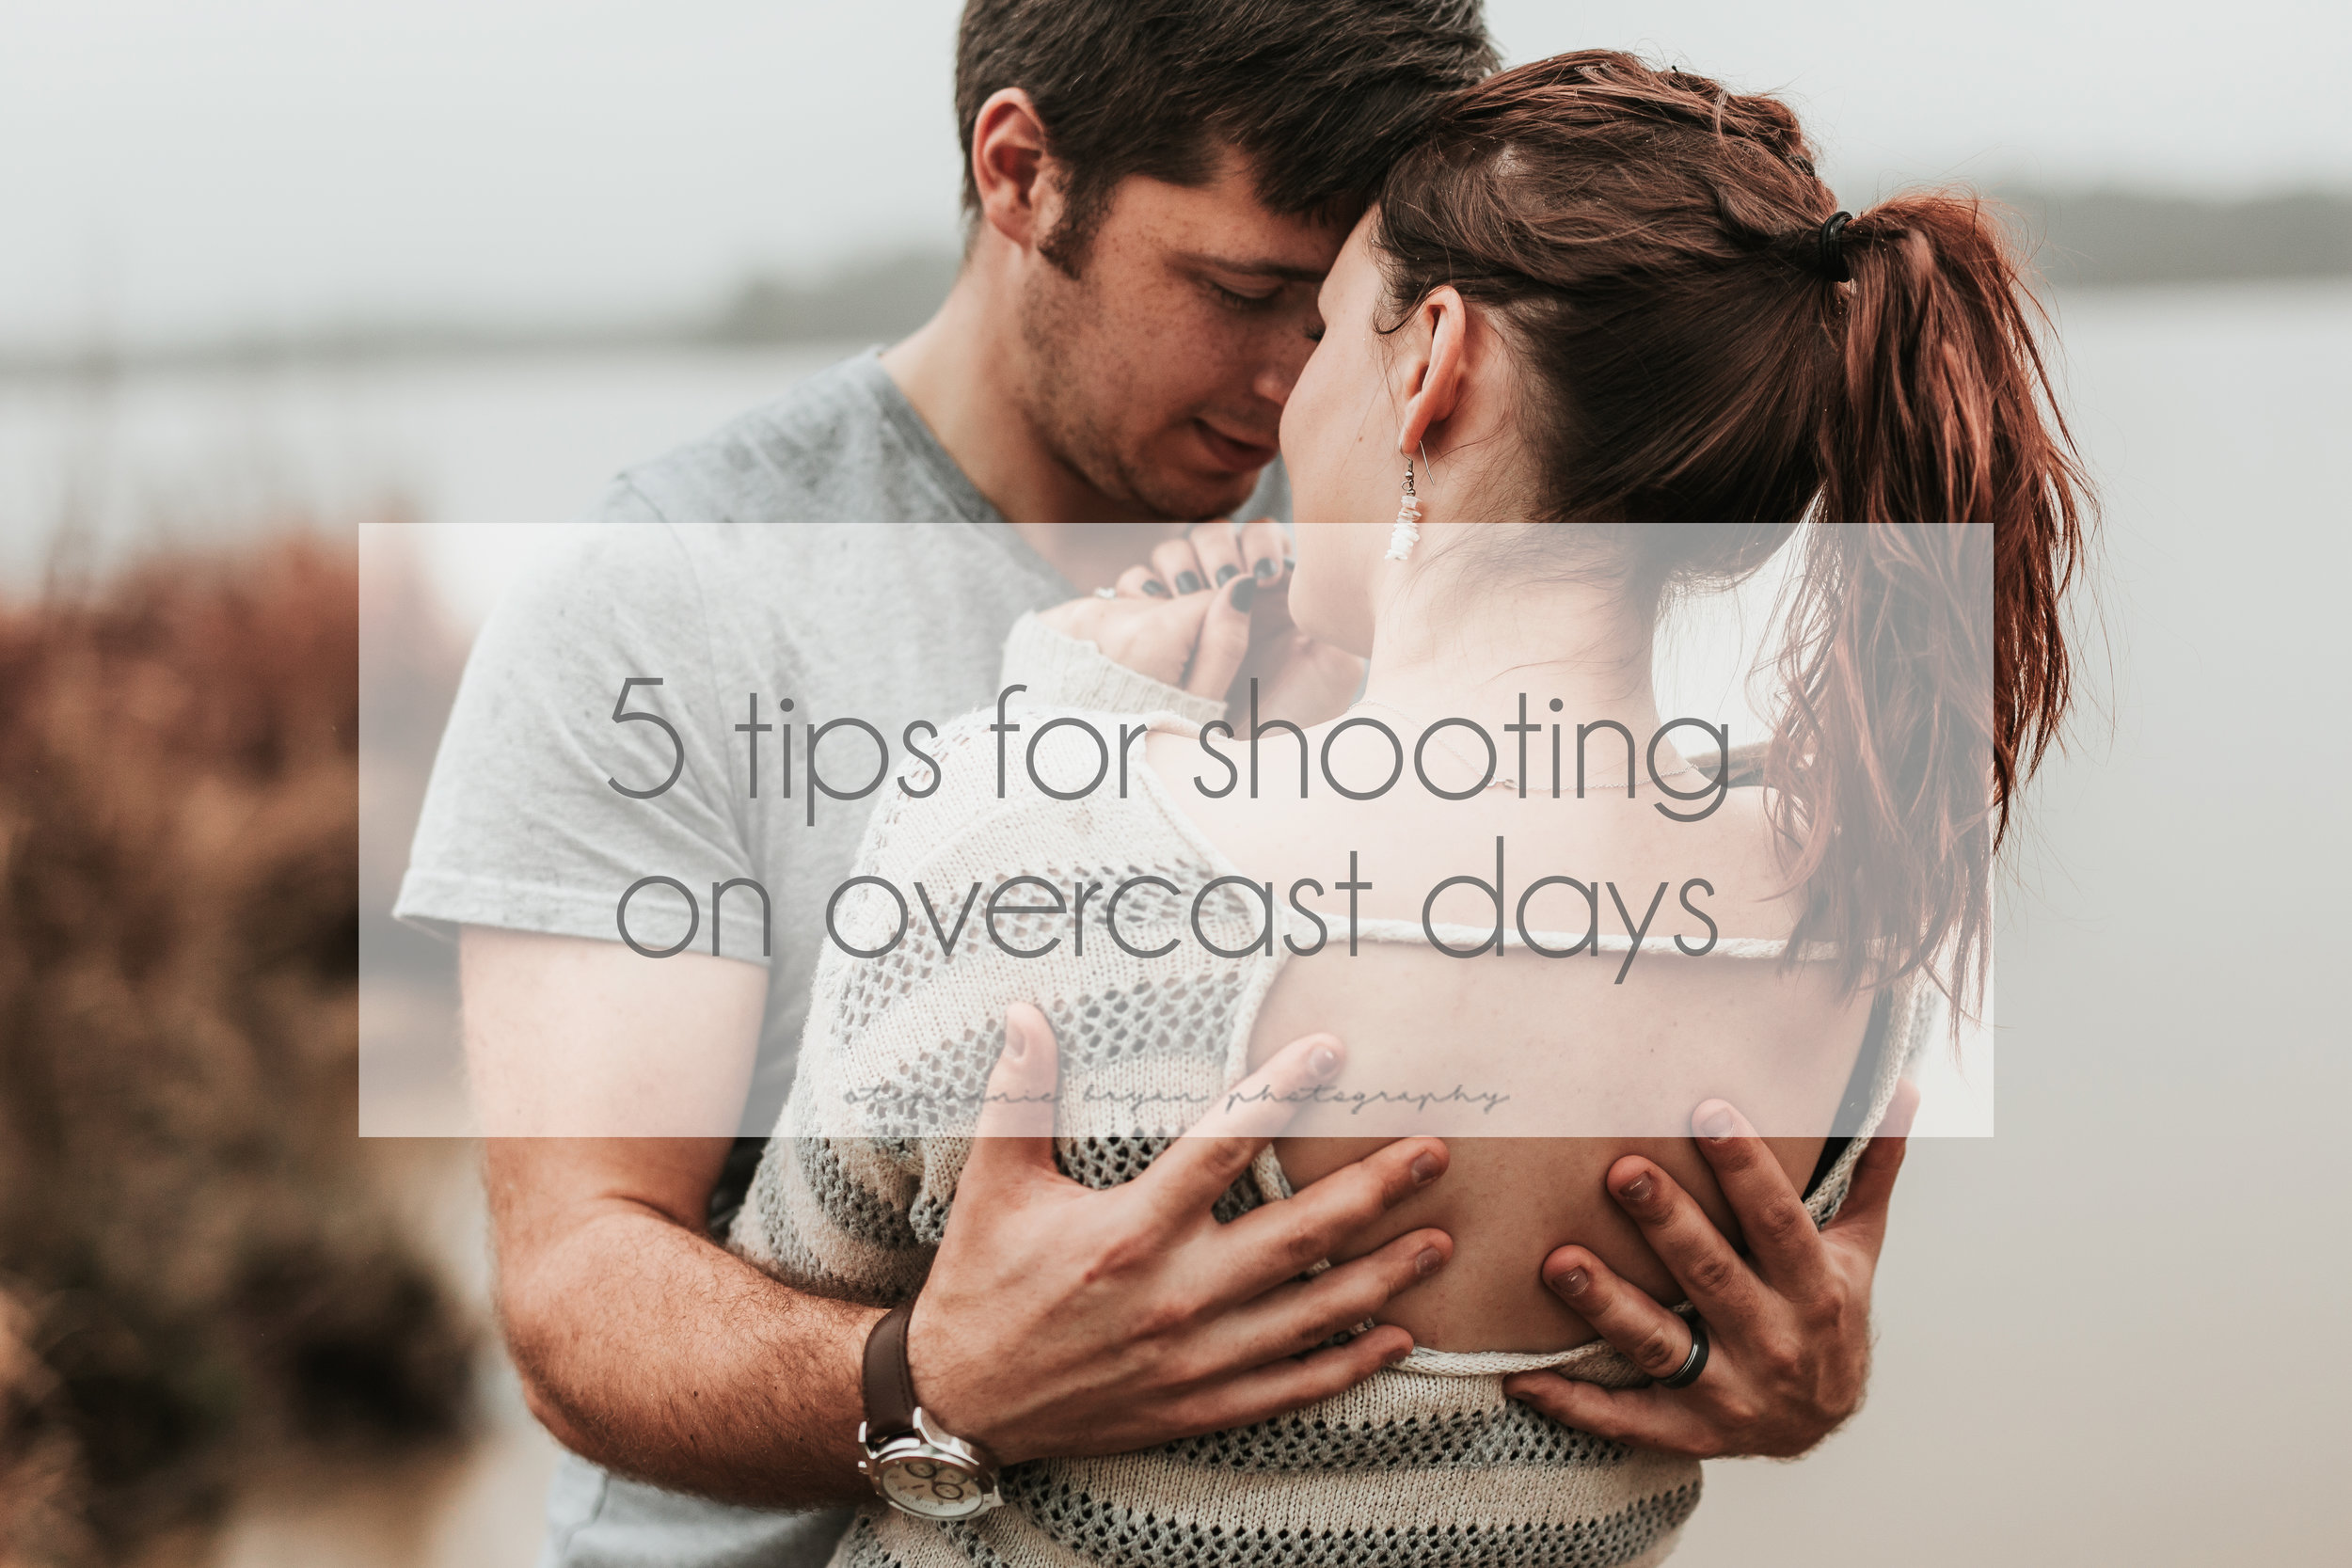 Stephanie Bryan Photography - 5 tips for shooting on overcast days